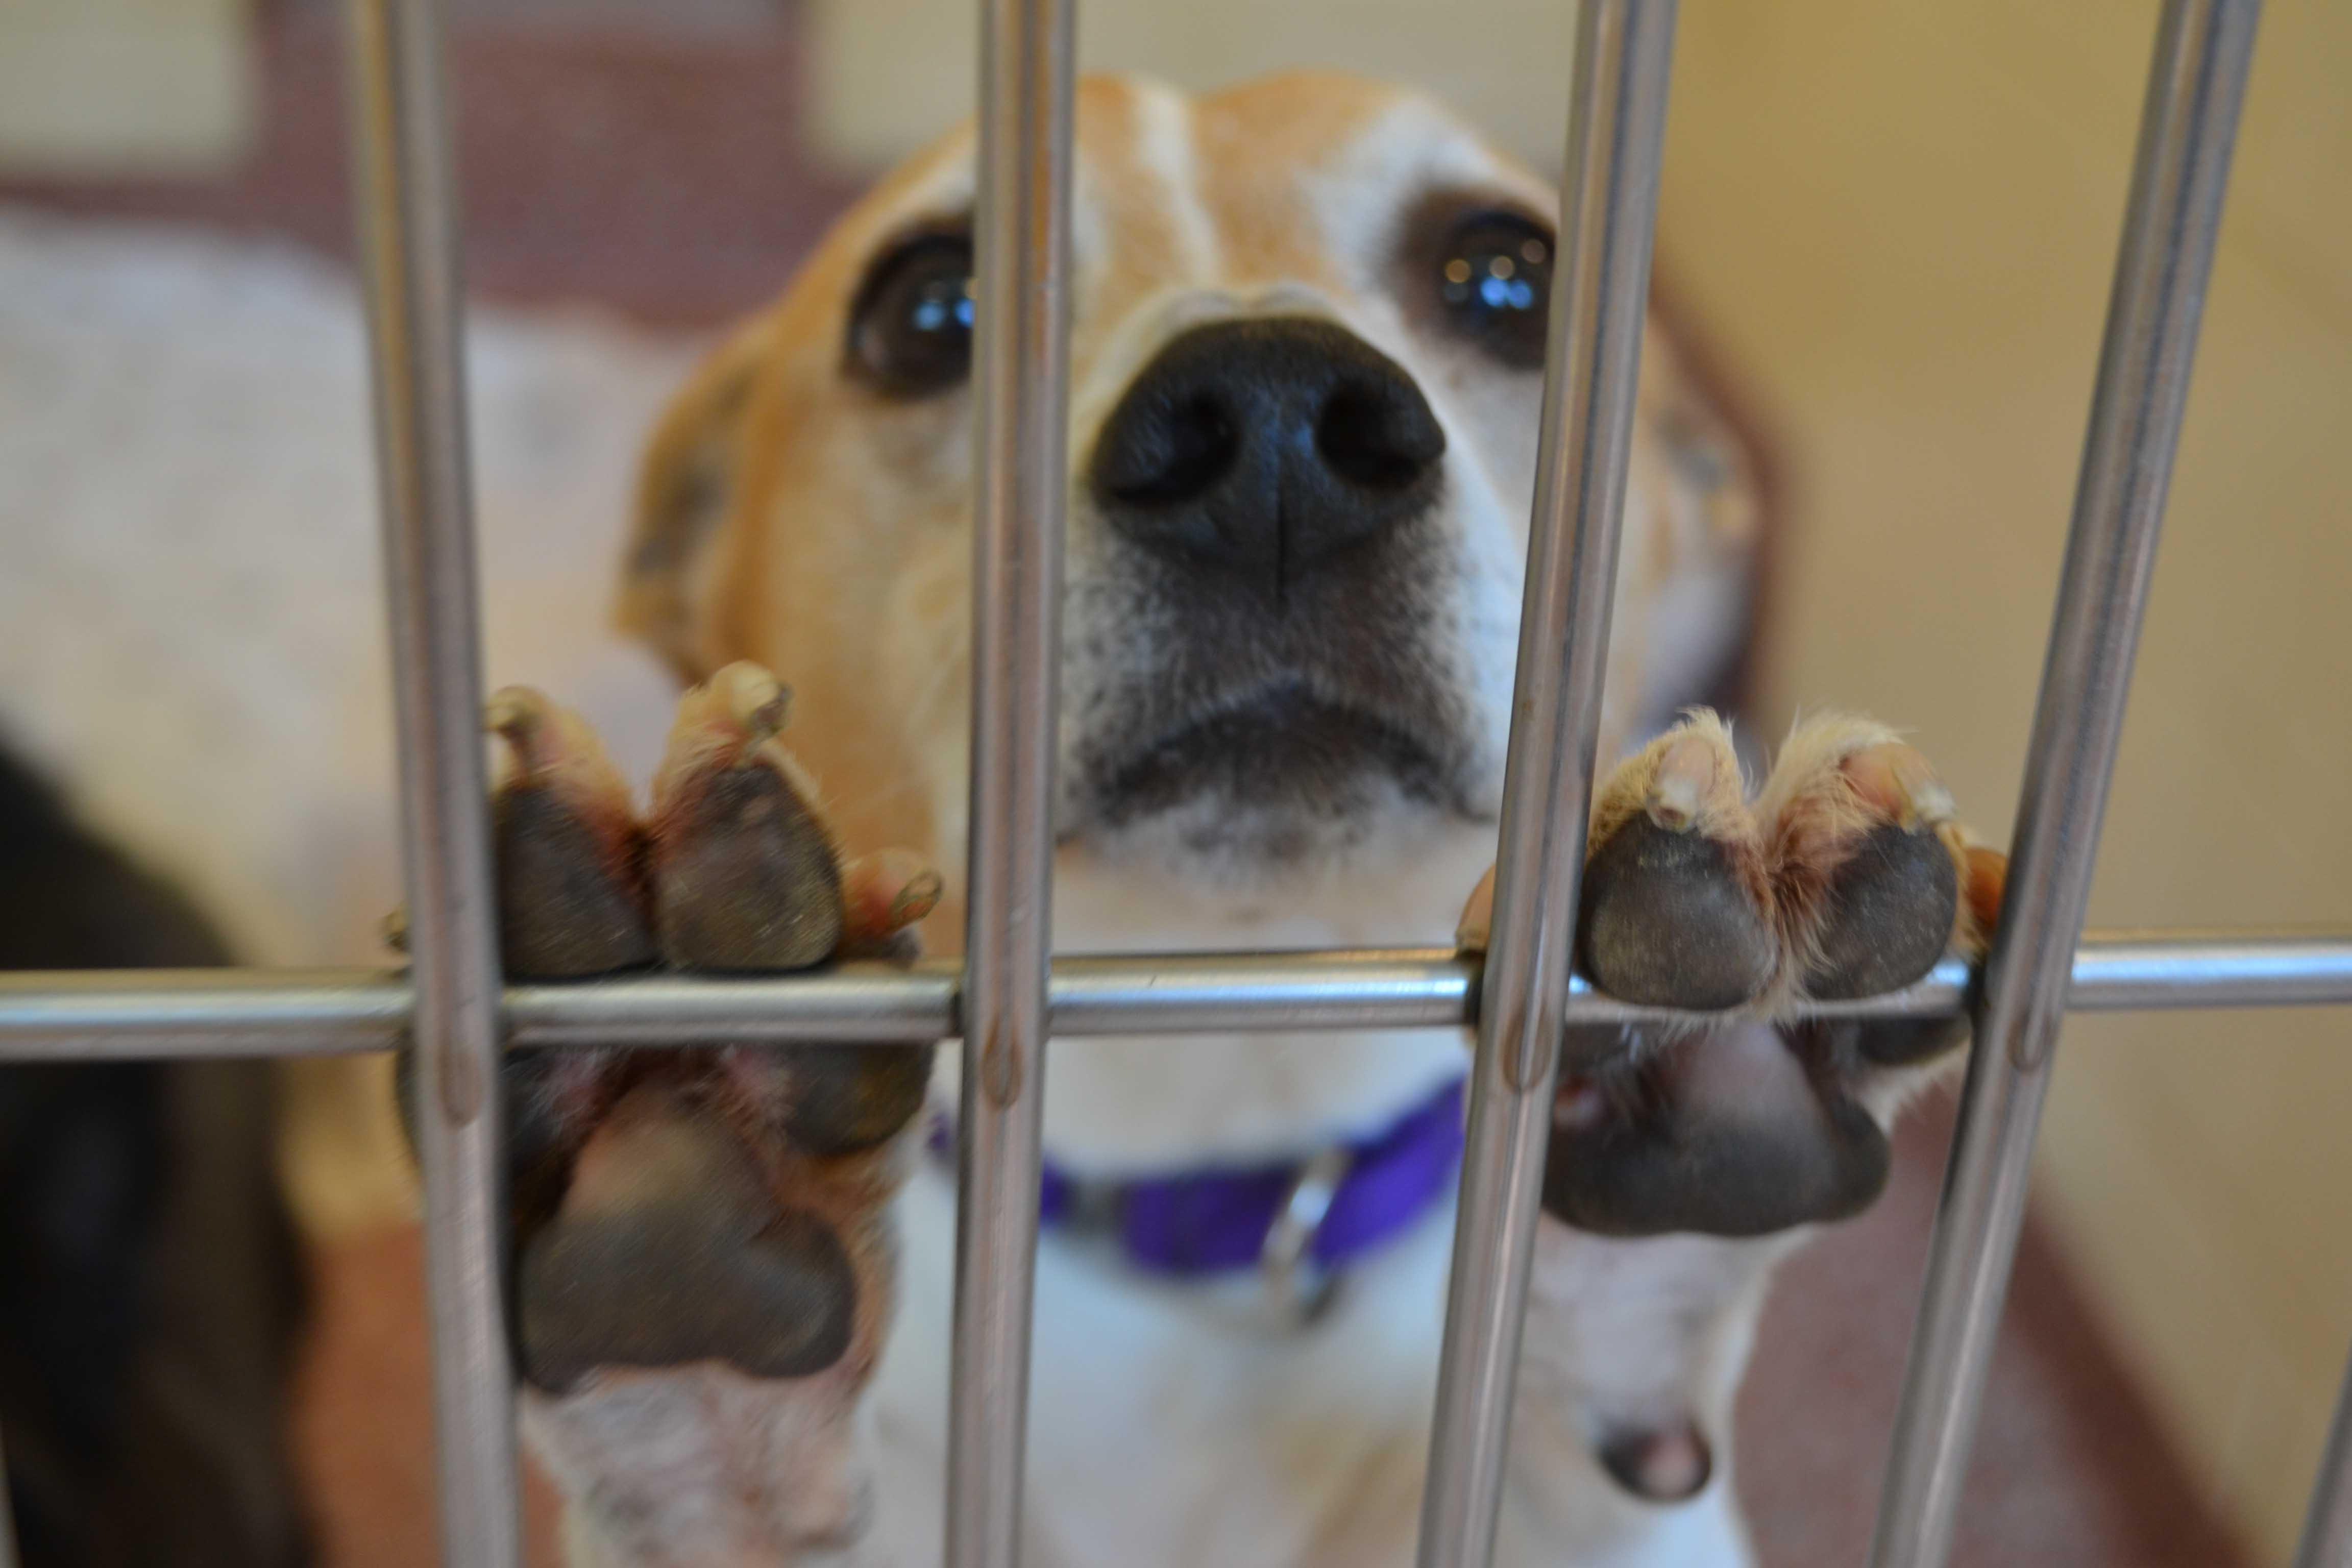 How To Help Stop Puppy Mills - NHSPCA